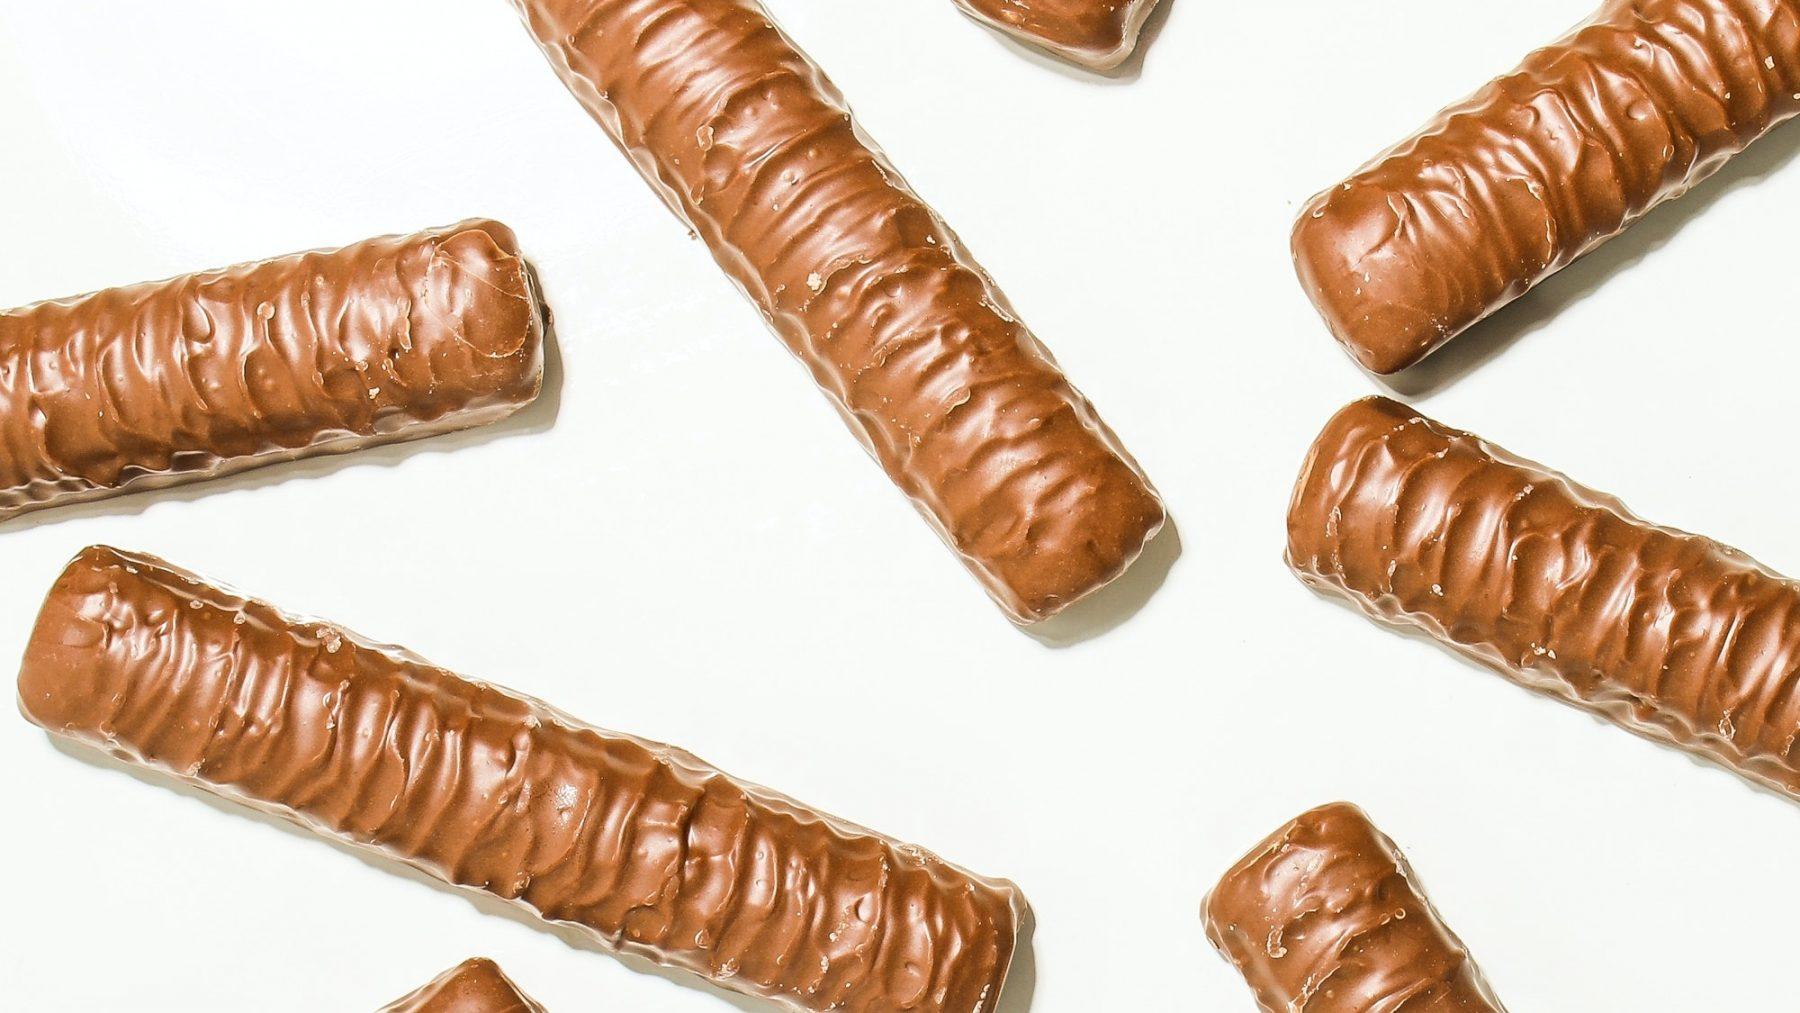 snoep chocola snoepgoed drop